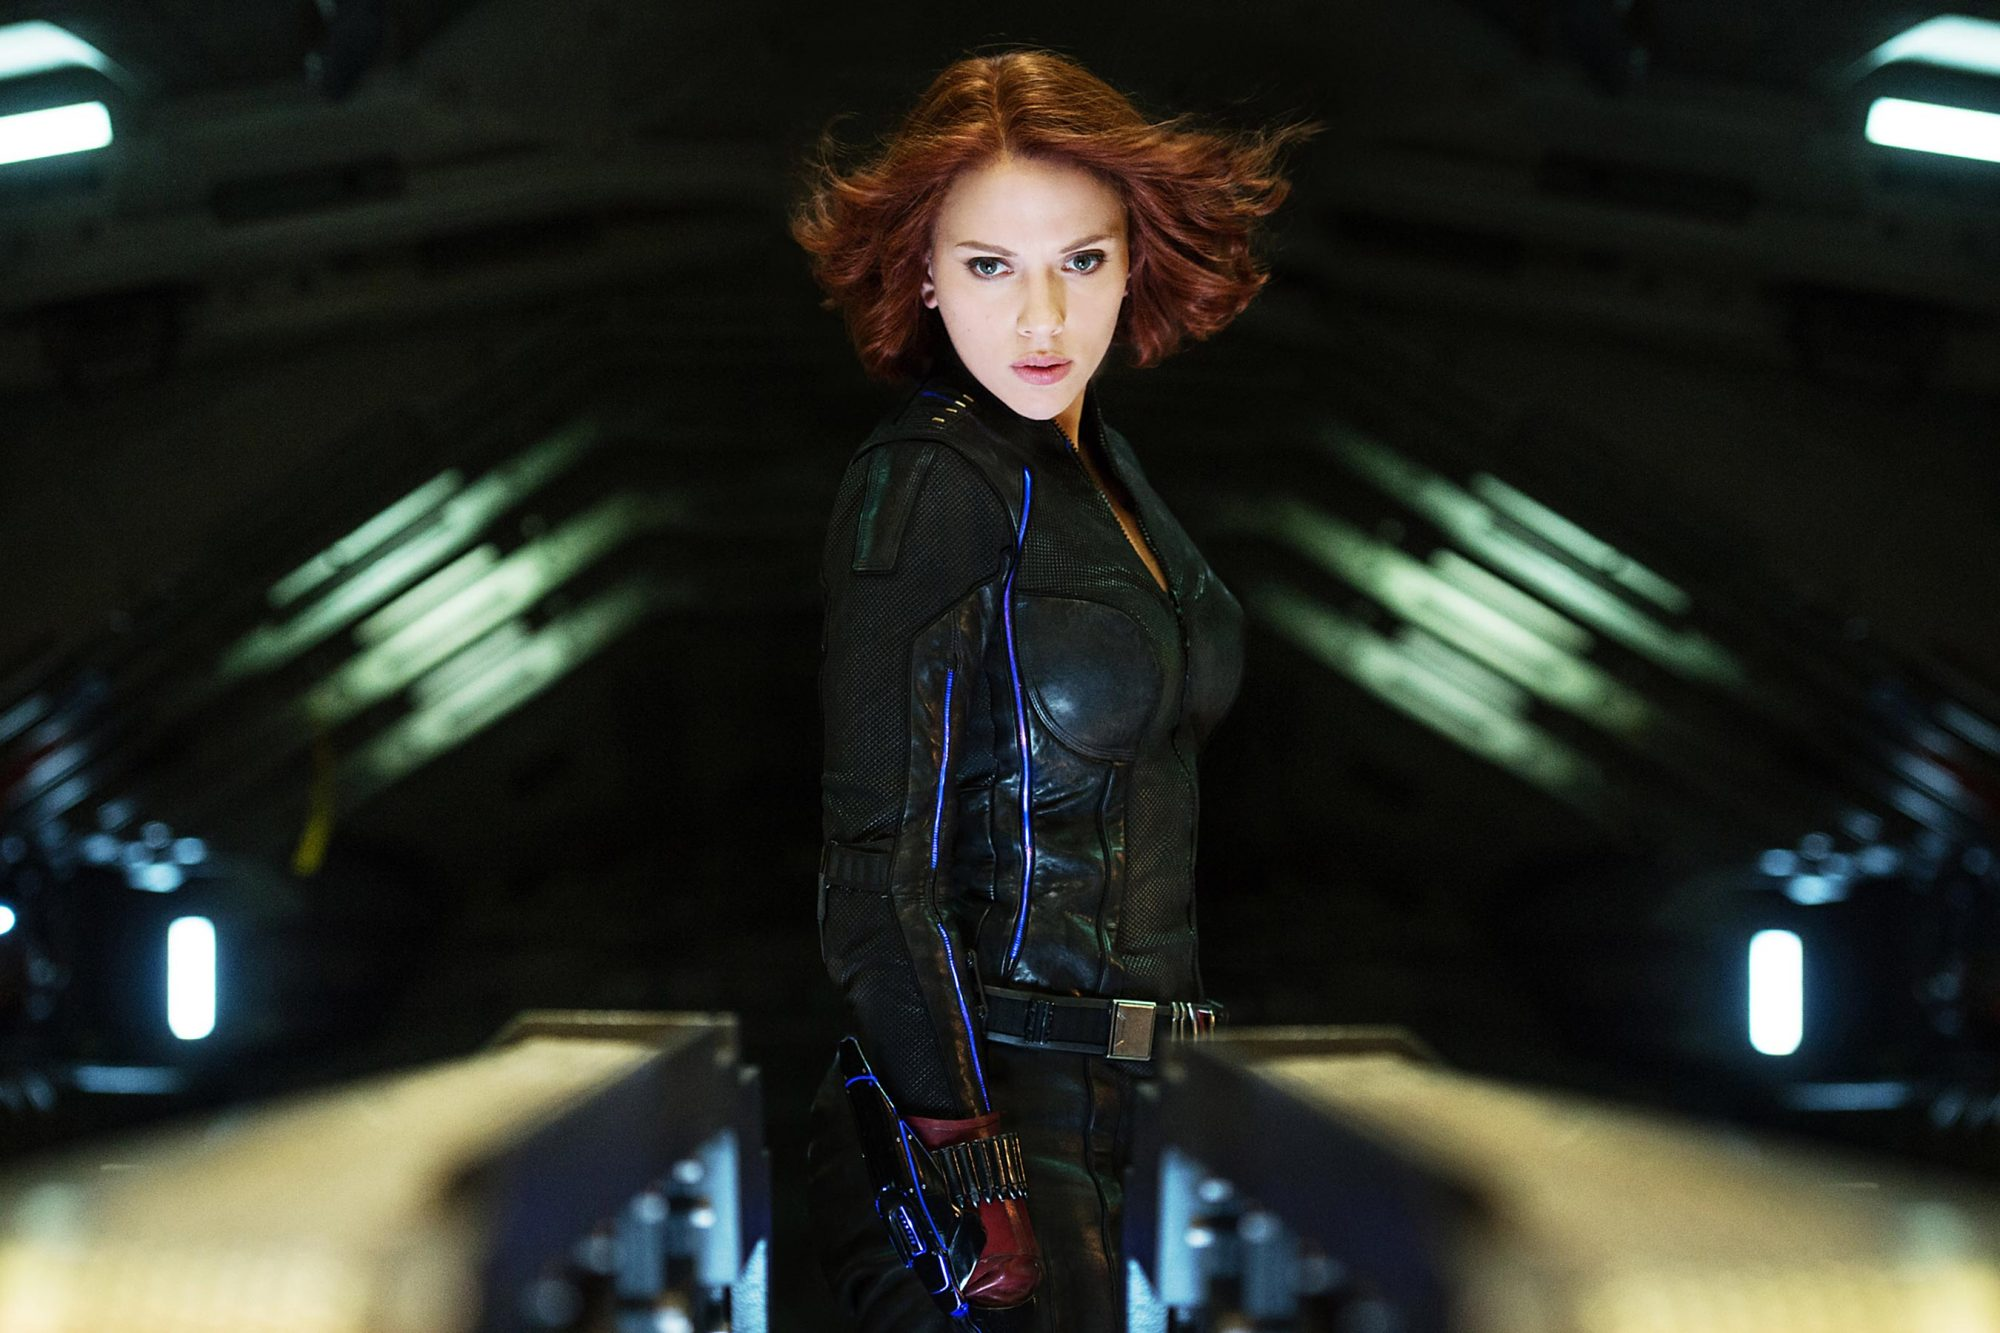 AVENGERS: AGE OF ULTRON, Scarlett Johansson as Natasha Romanoff/Black Widow, 2015. ph: Jay Maidment